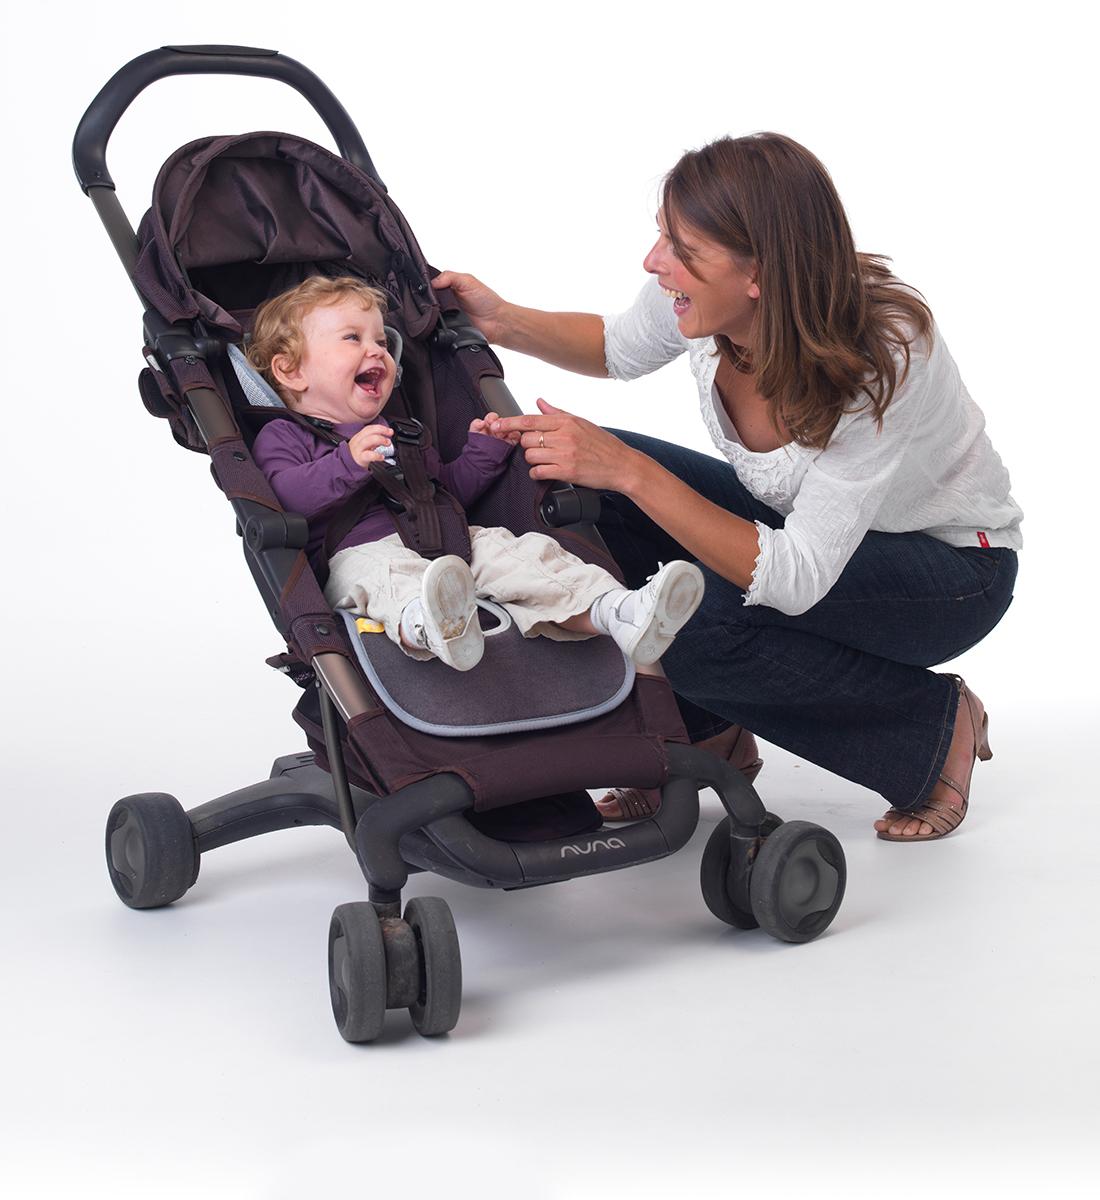 Aeromoov zračna podloga za dječja kolica